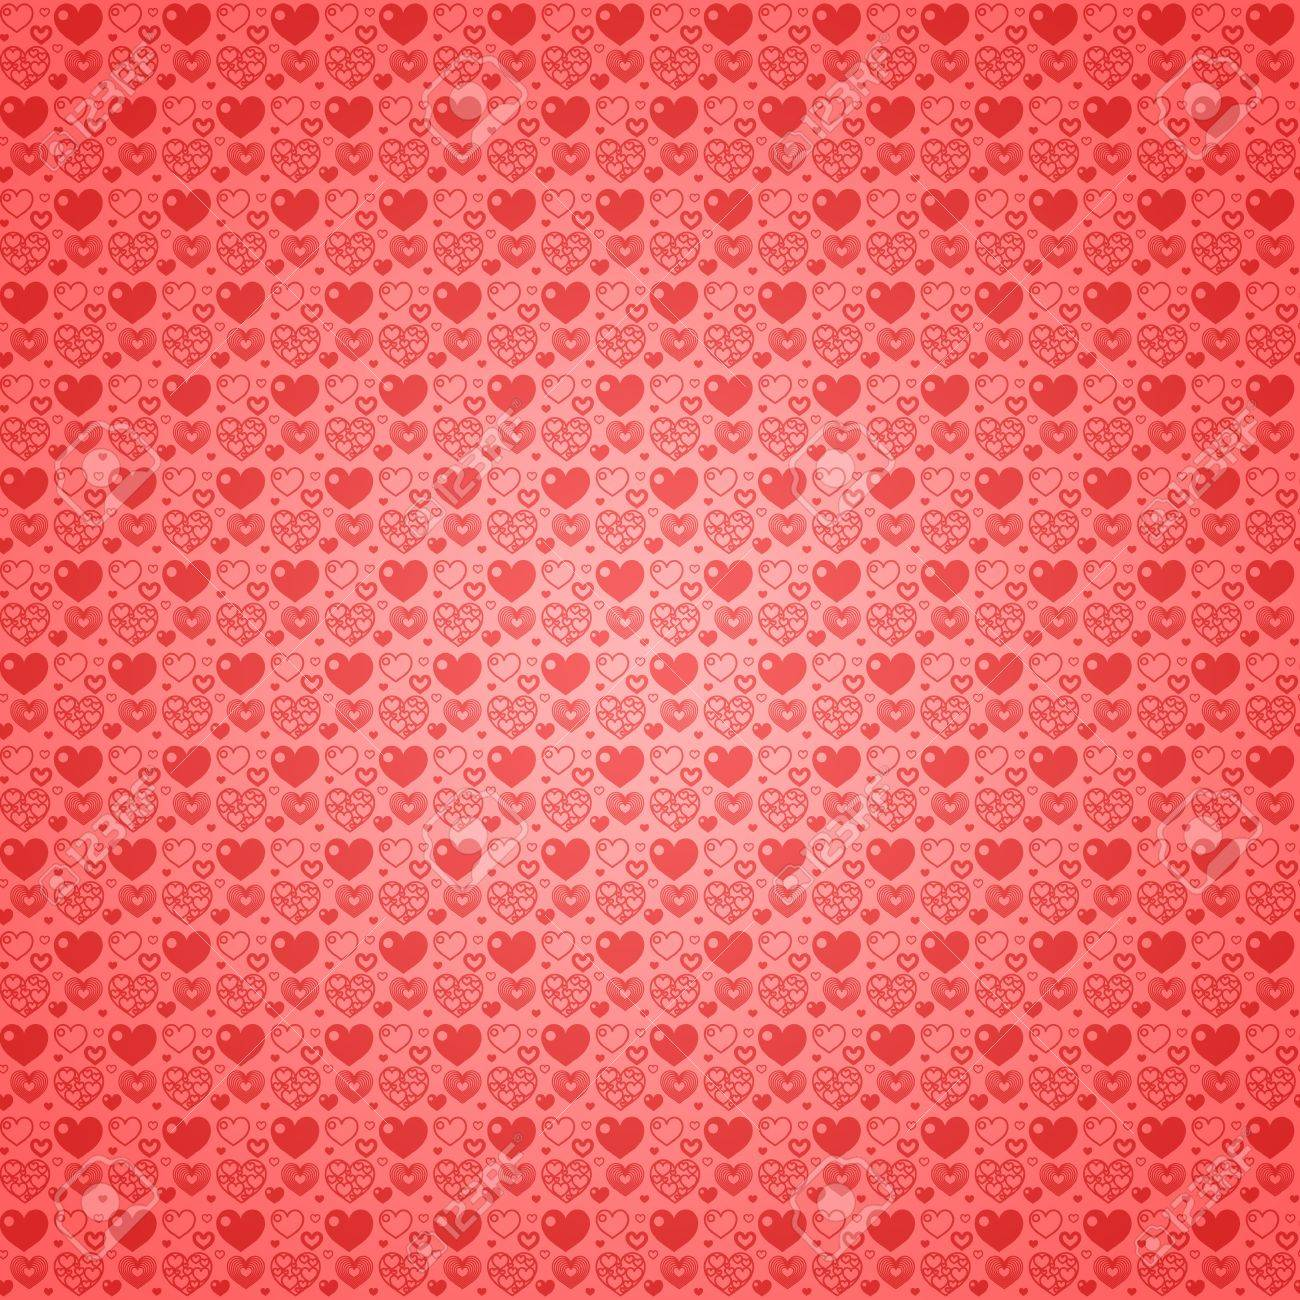 Seamless Pattern Wallpaper Light Red Hearts Stock Photo